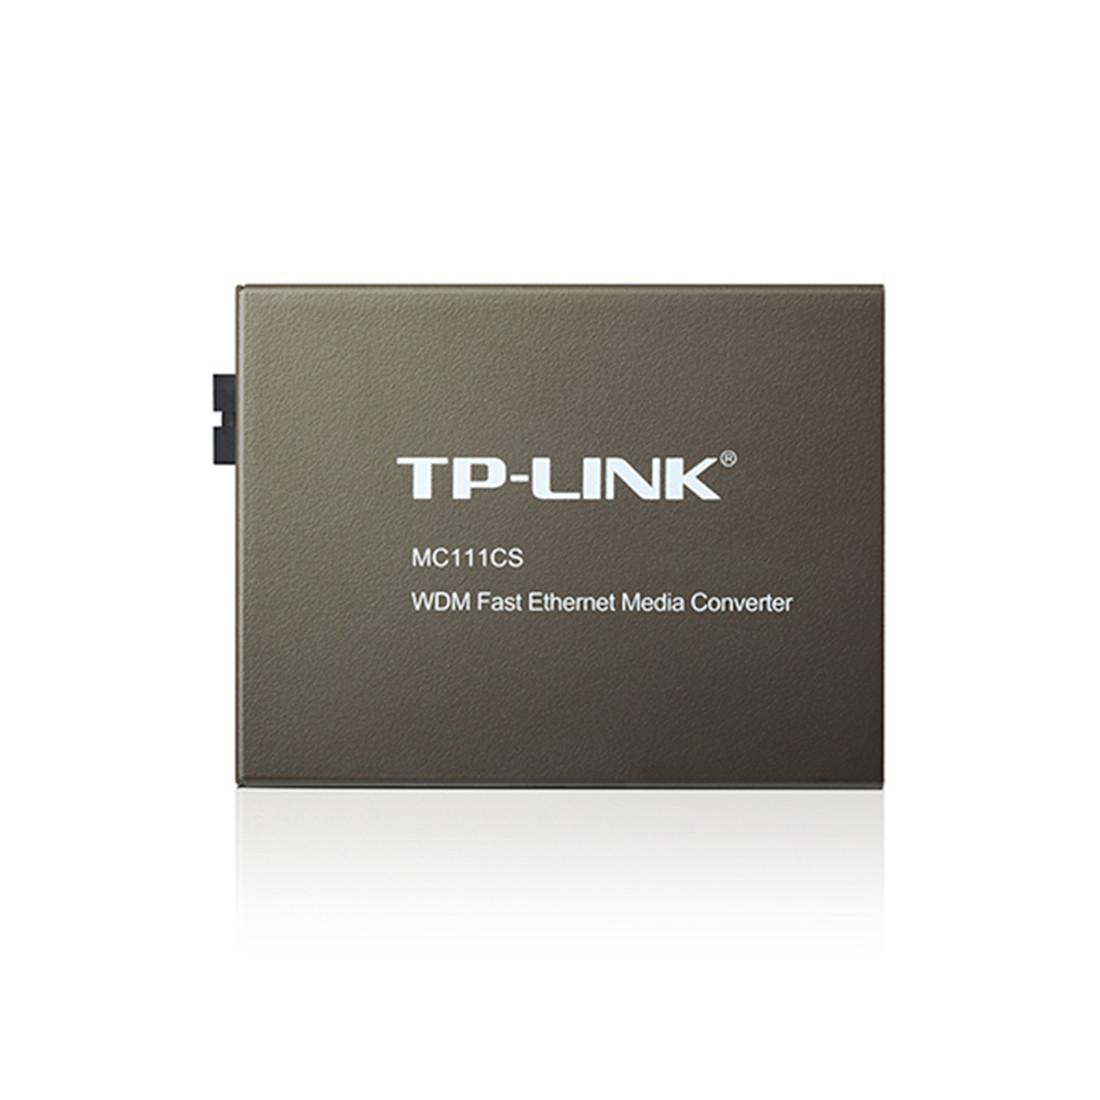 TP-LINK MC111CS Медиаконвертер